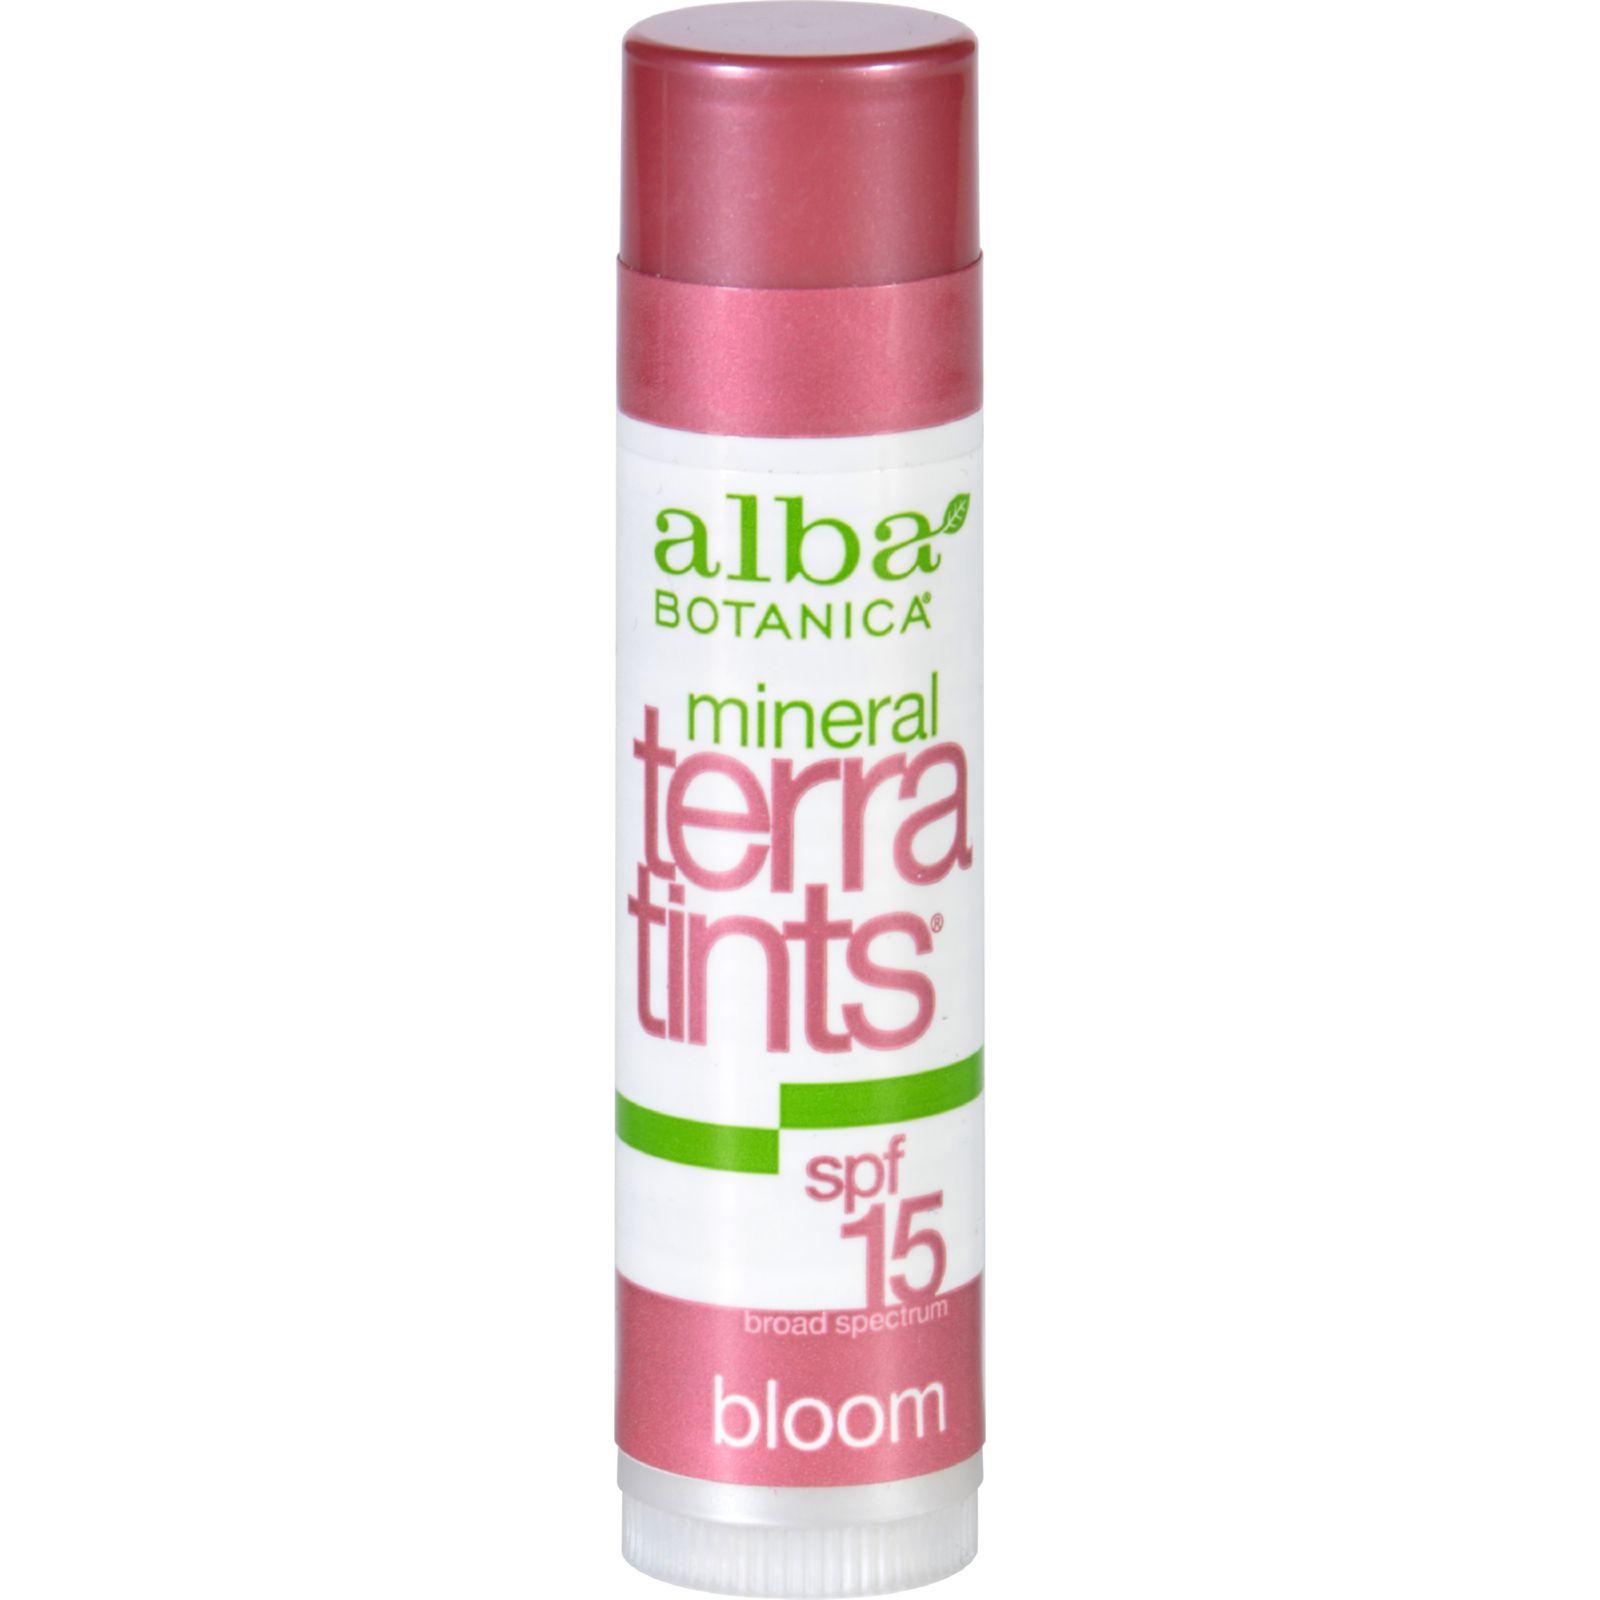 Alba Botanica Bloom TerraTints Lip Balm SPF 8 - Case of 12 - .15 oz